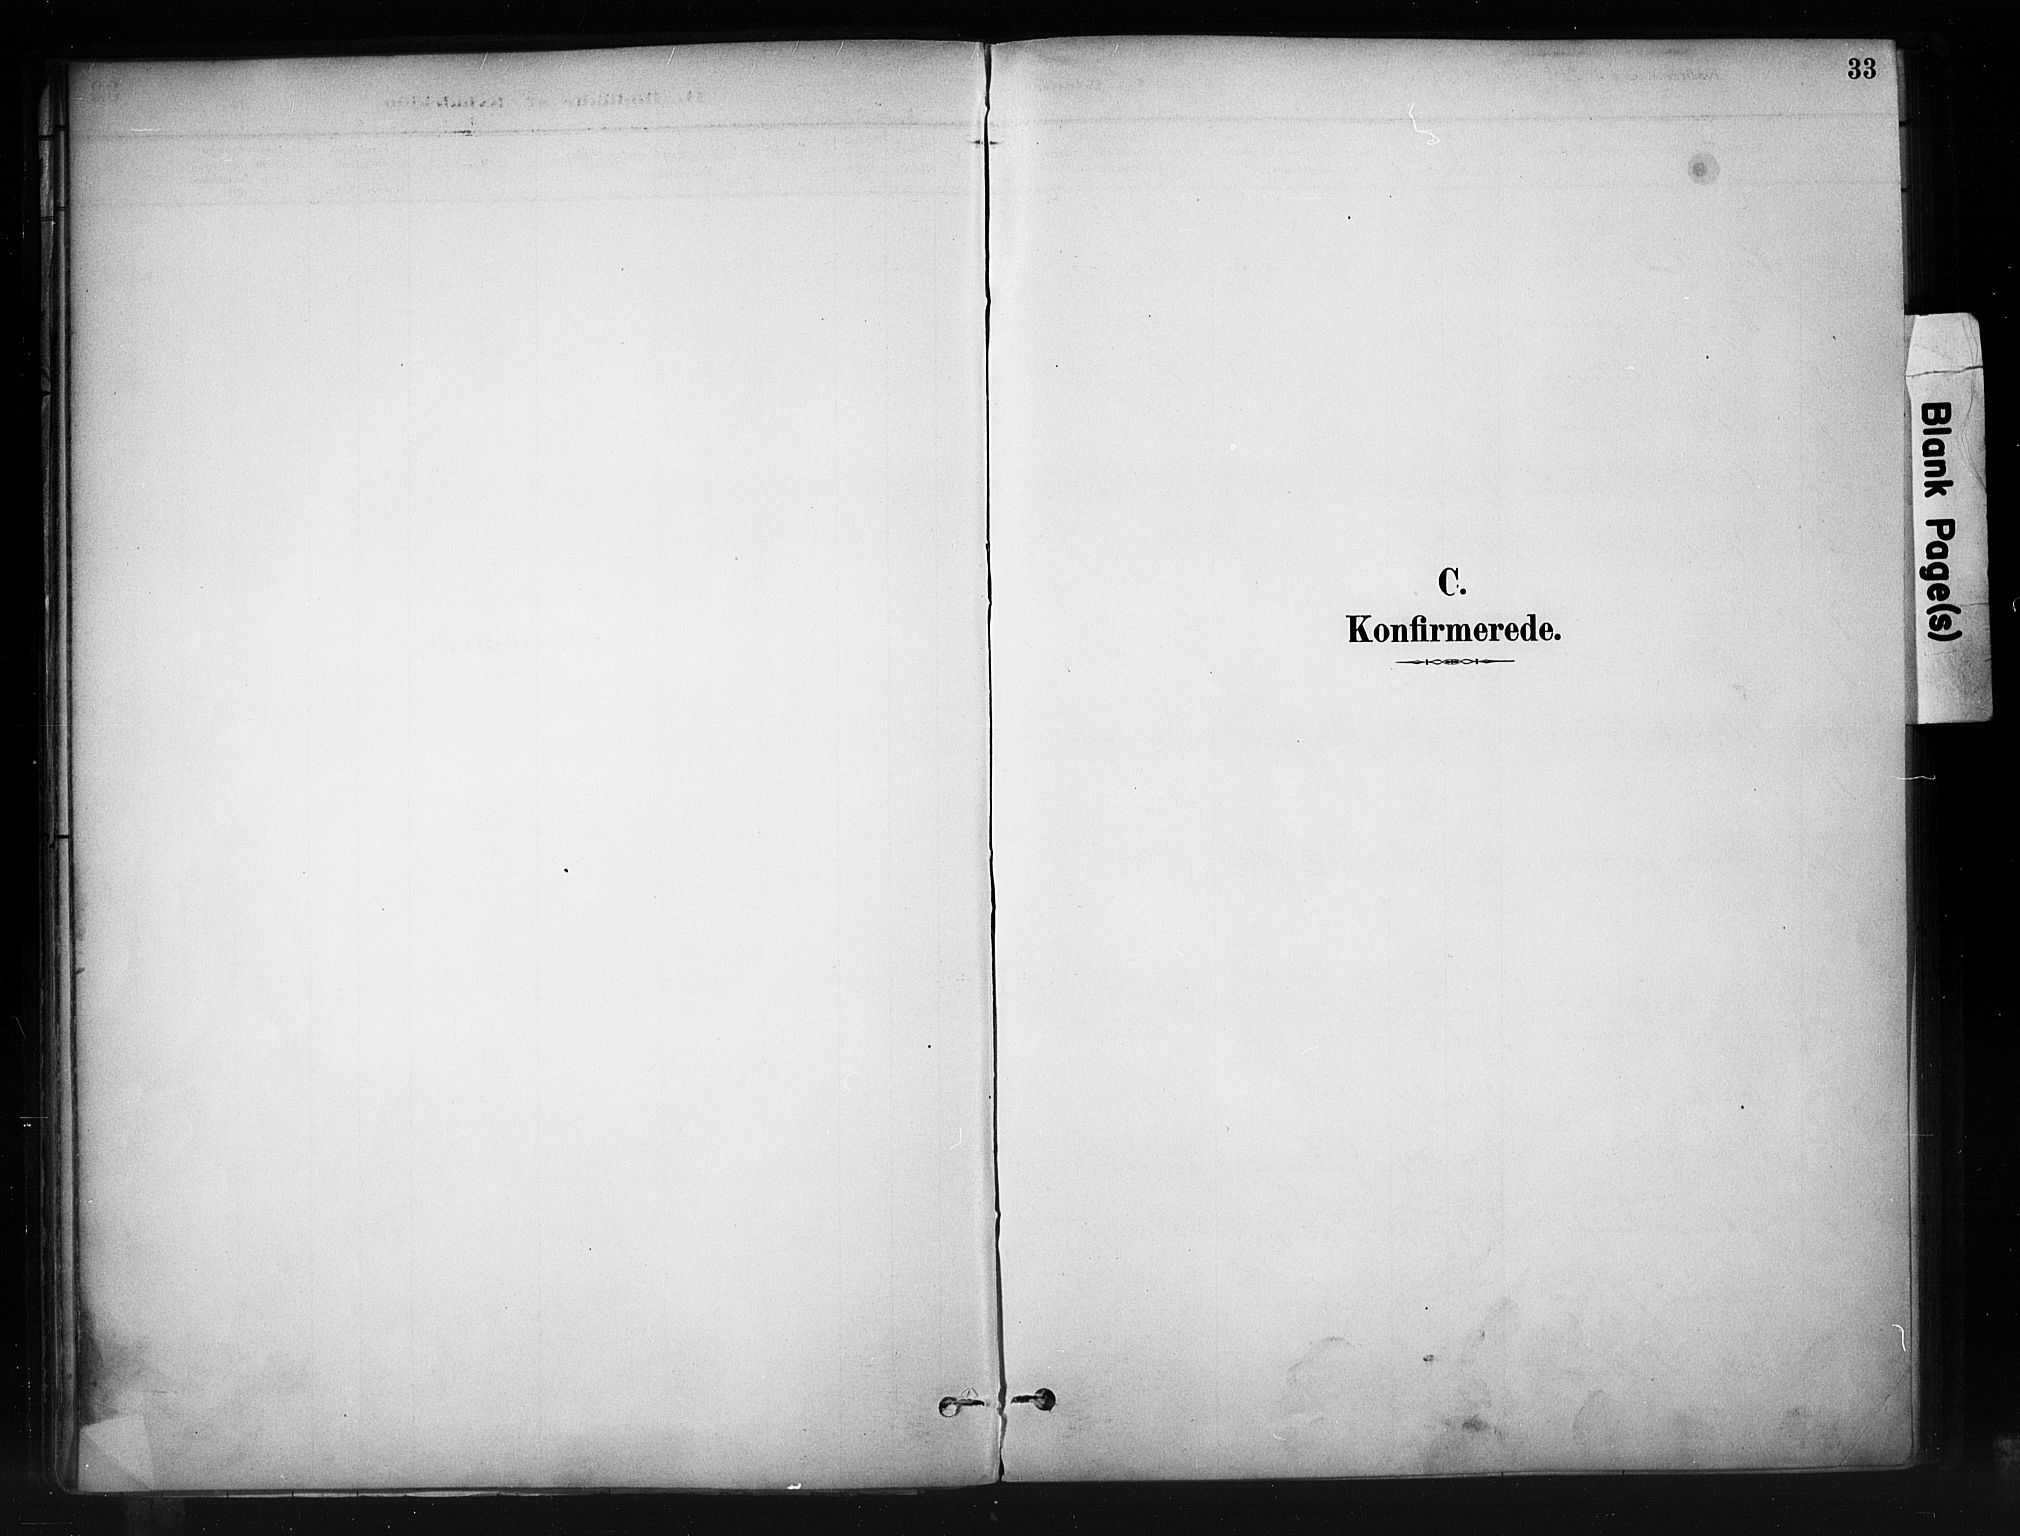 SAH, Nord-Aurdal prestekontor, Ministerialbok nr. 10, 1883-1896, s. 33